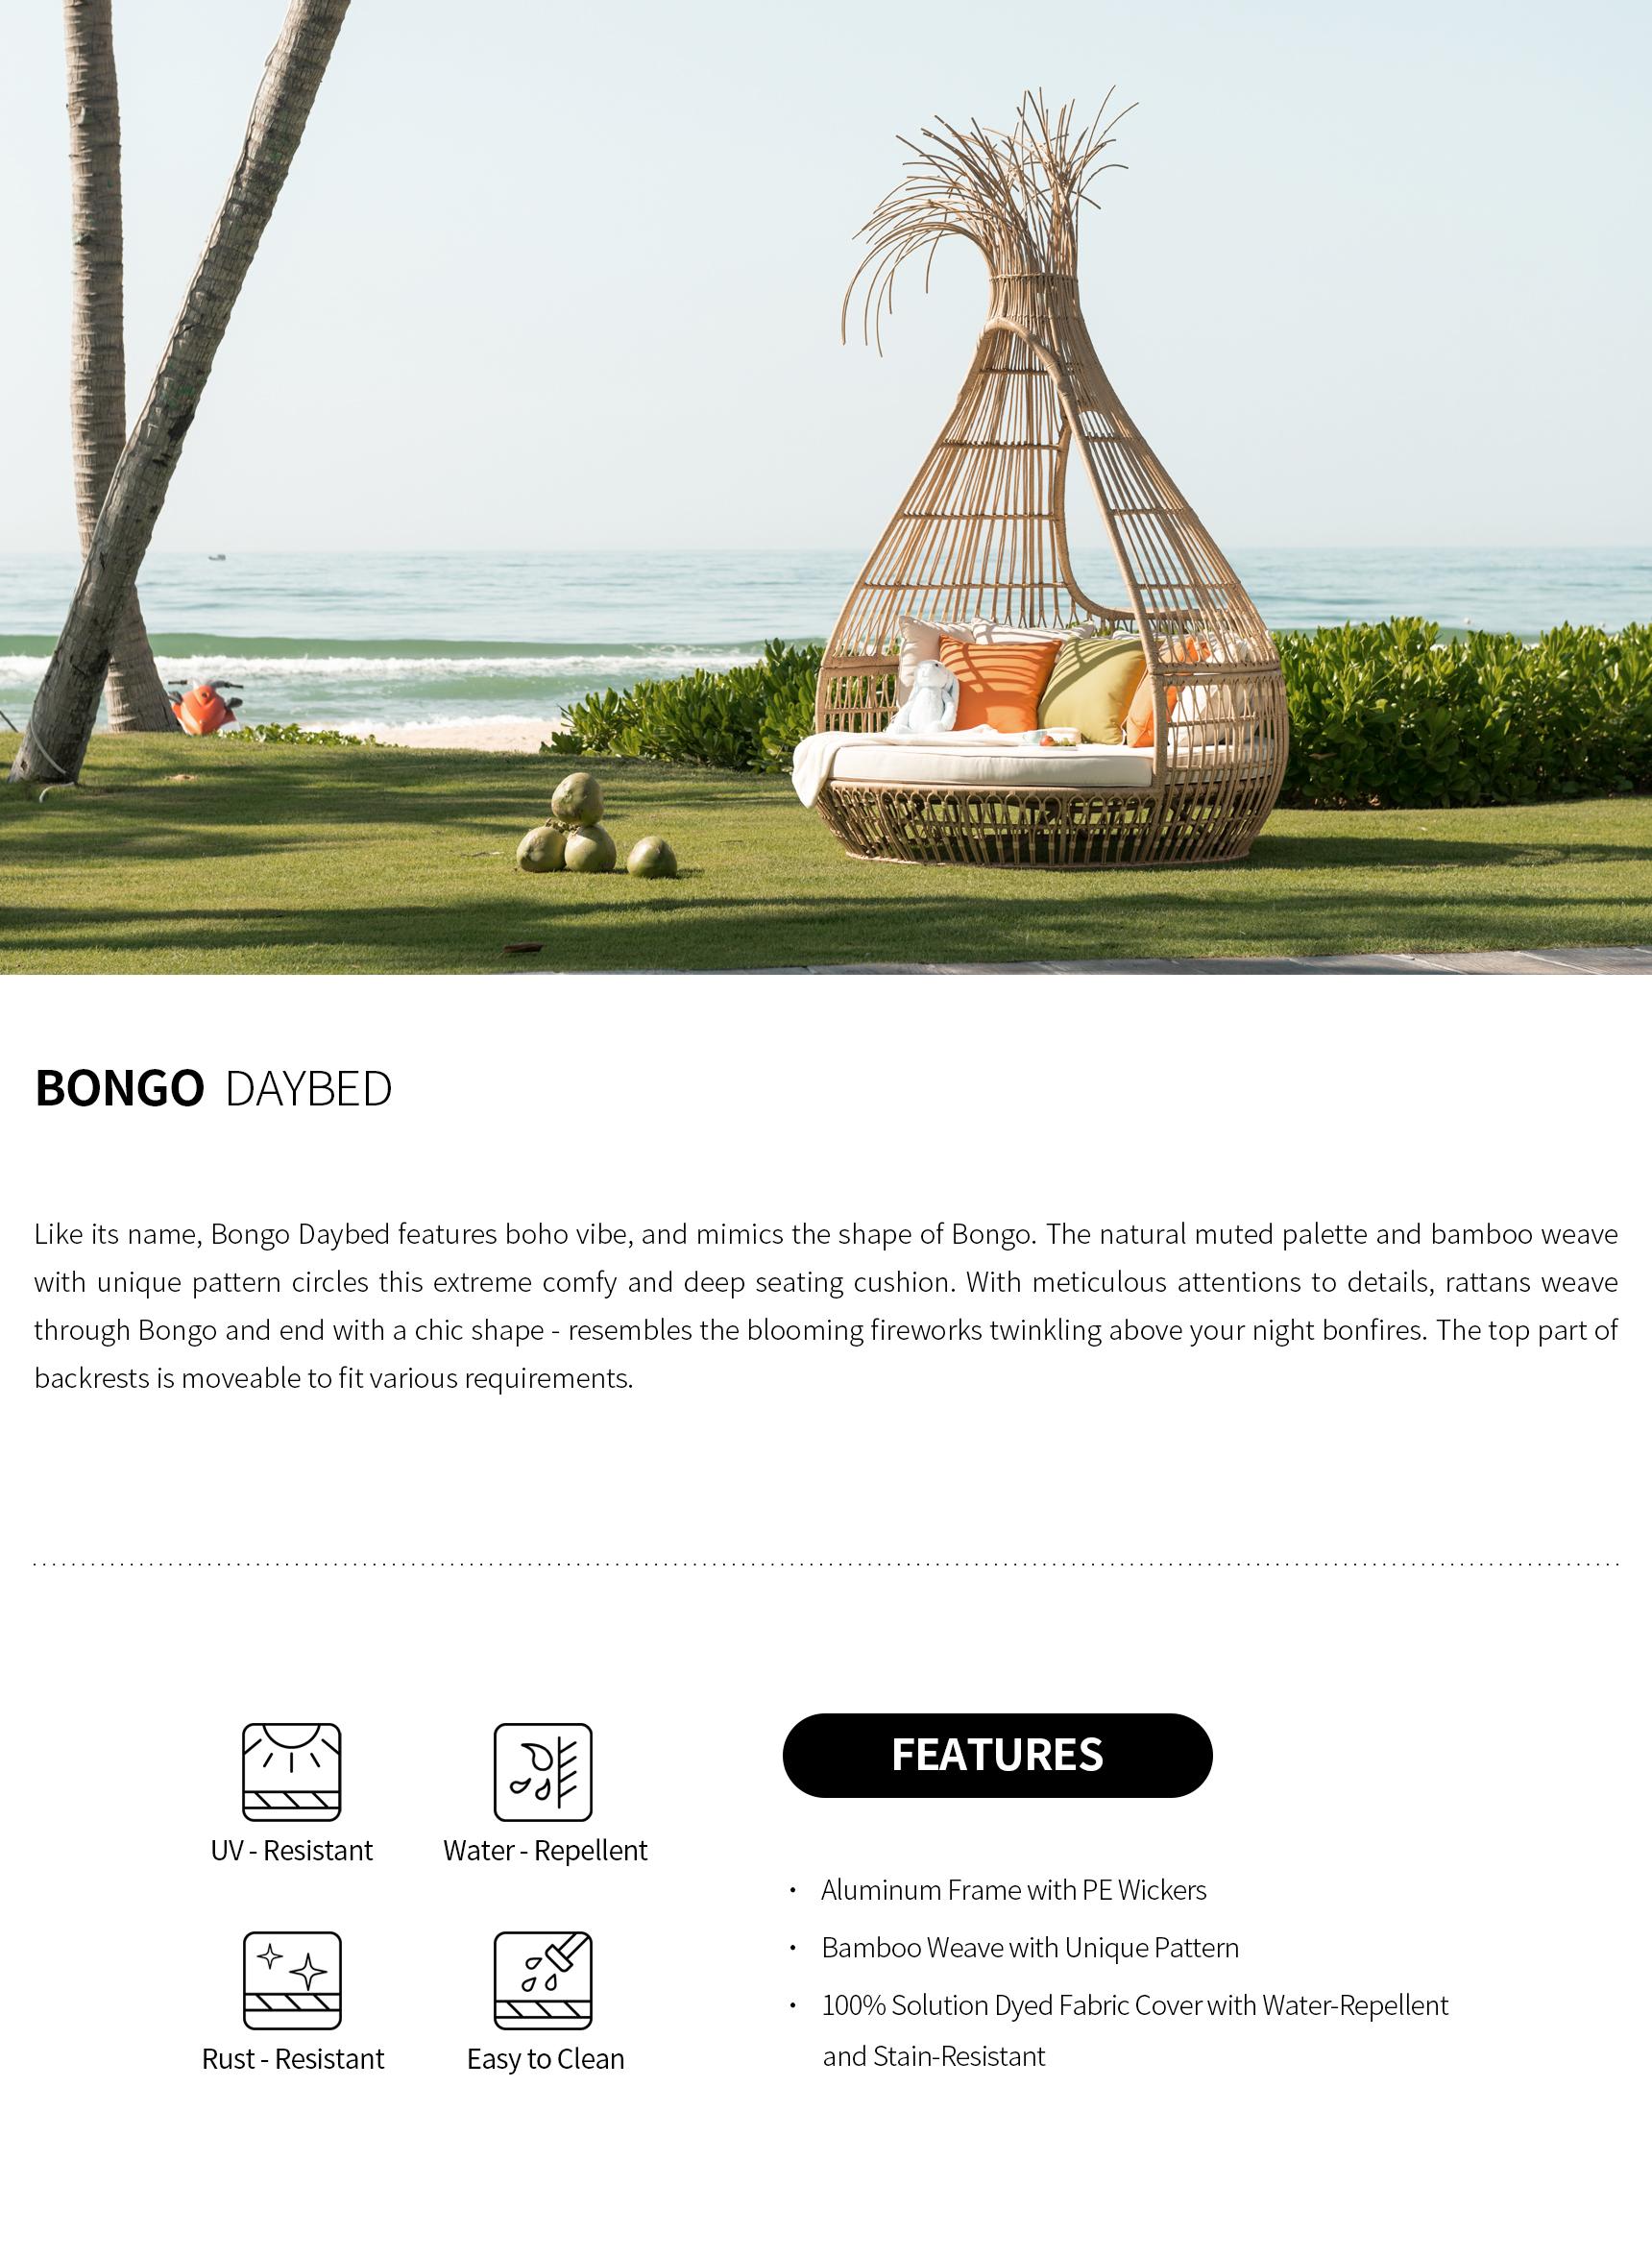 Bongo Daybed详情页